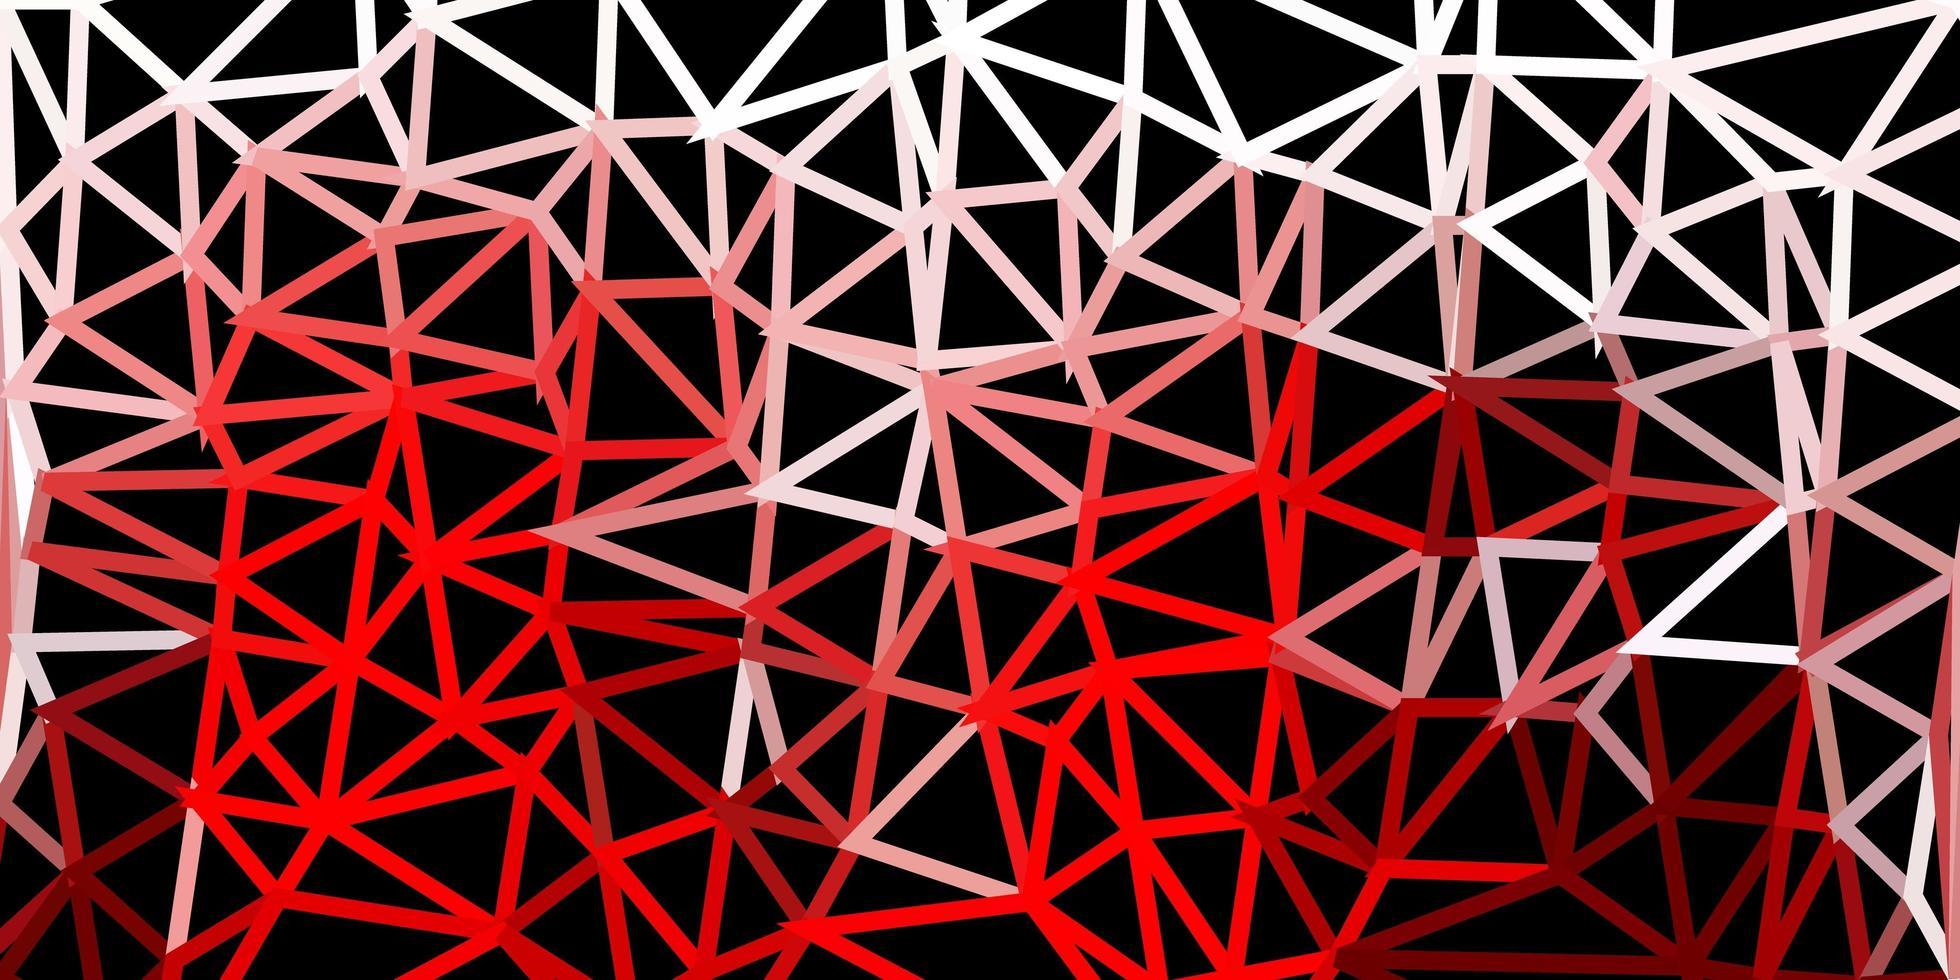 dunkelrote Poly-Dreieck-Vorlage. vektor